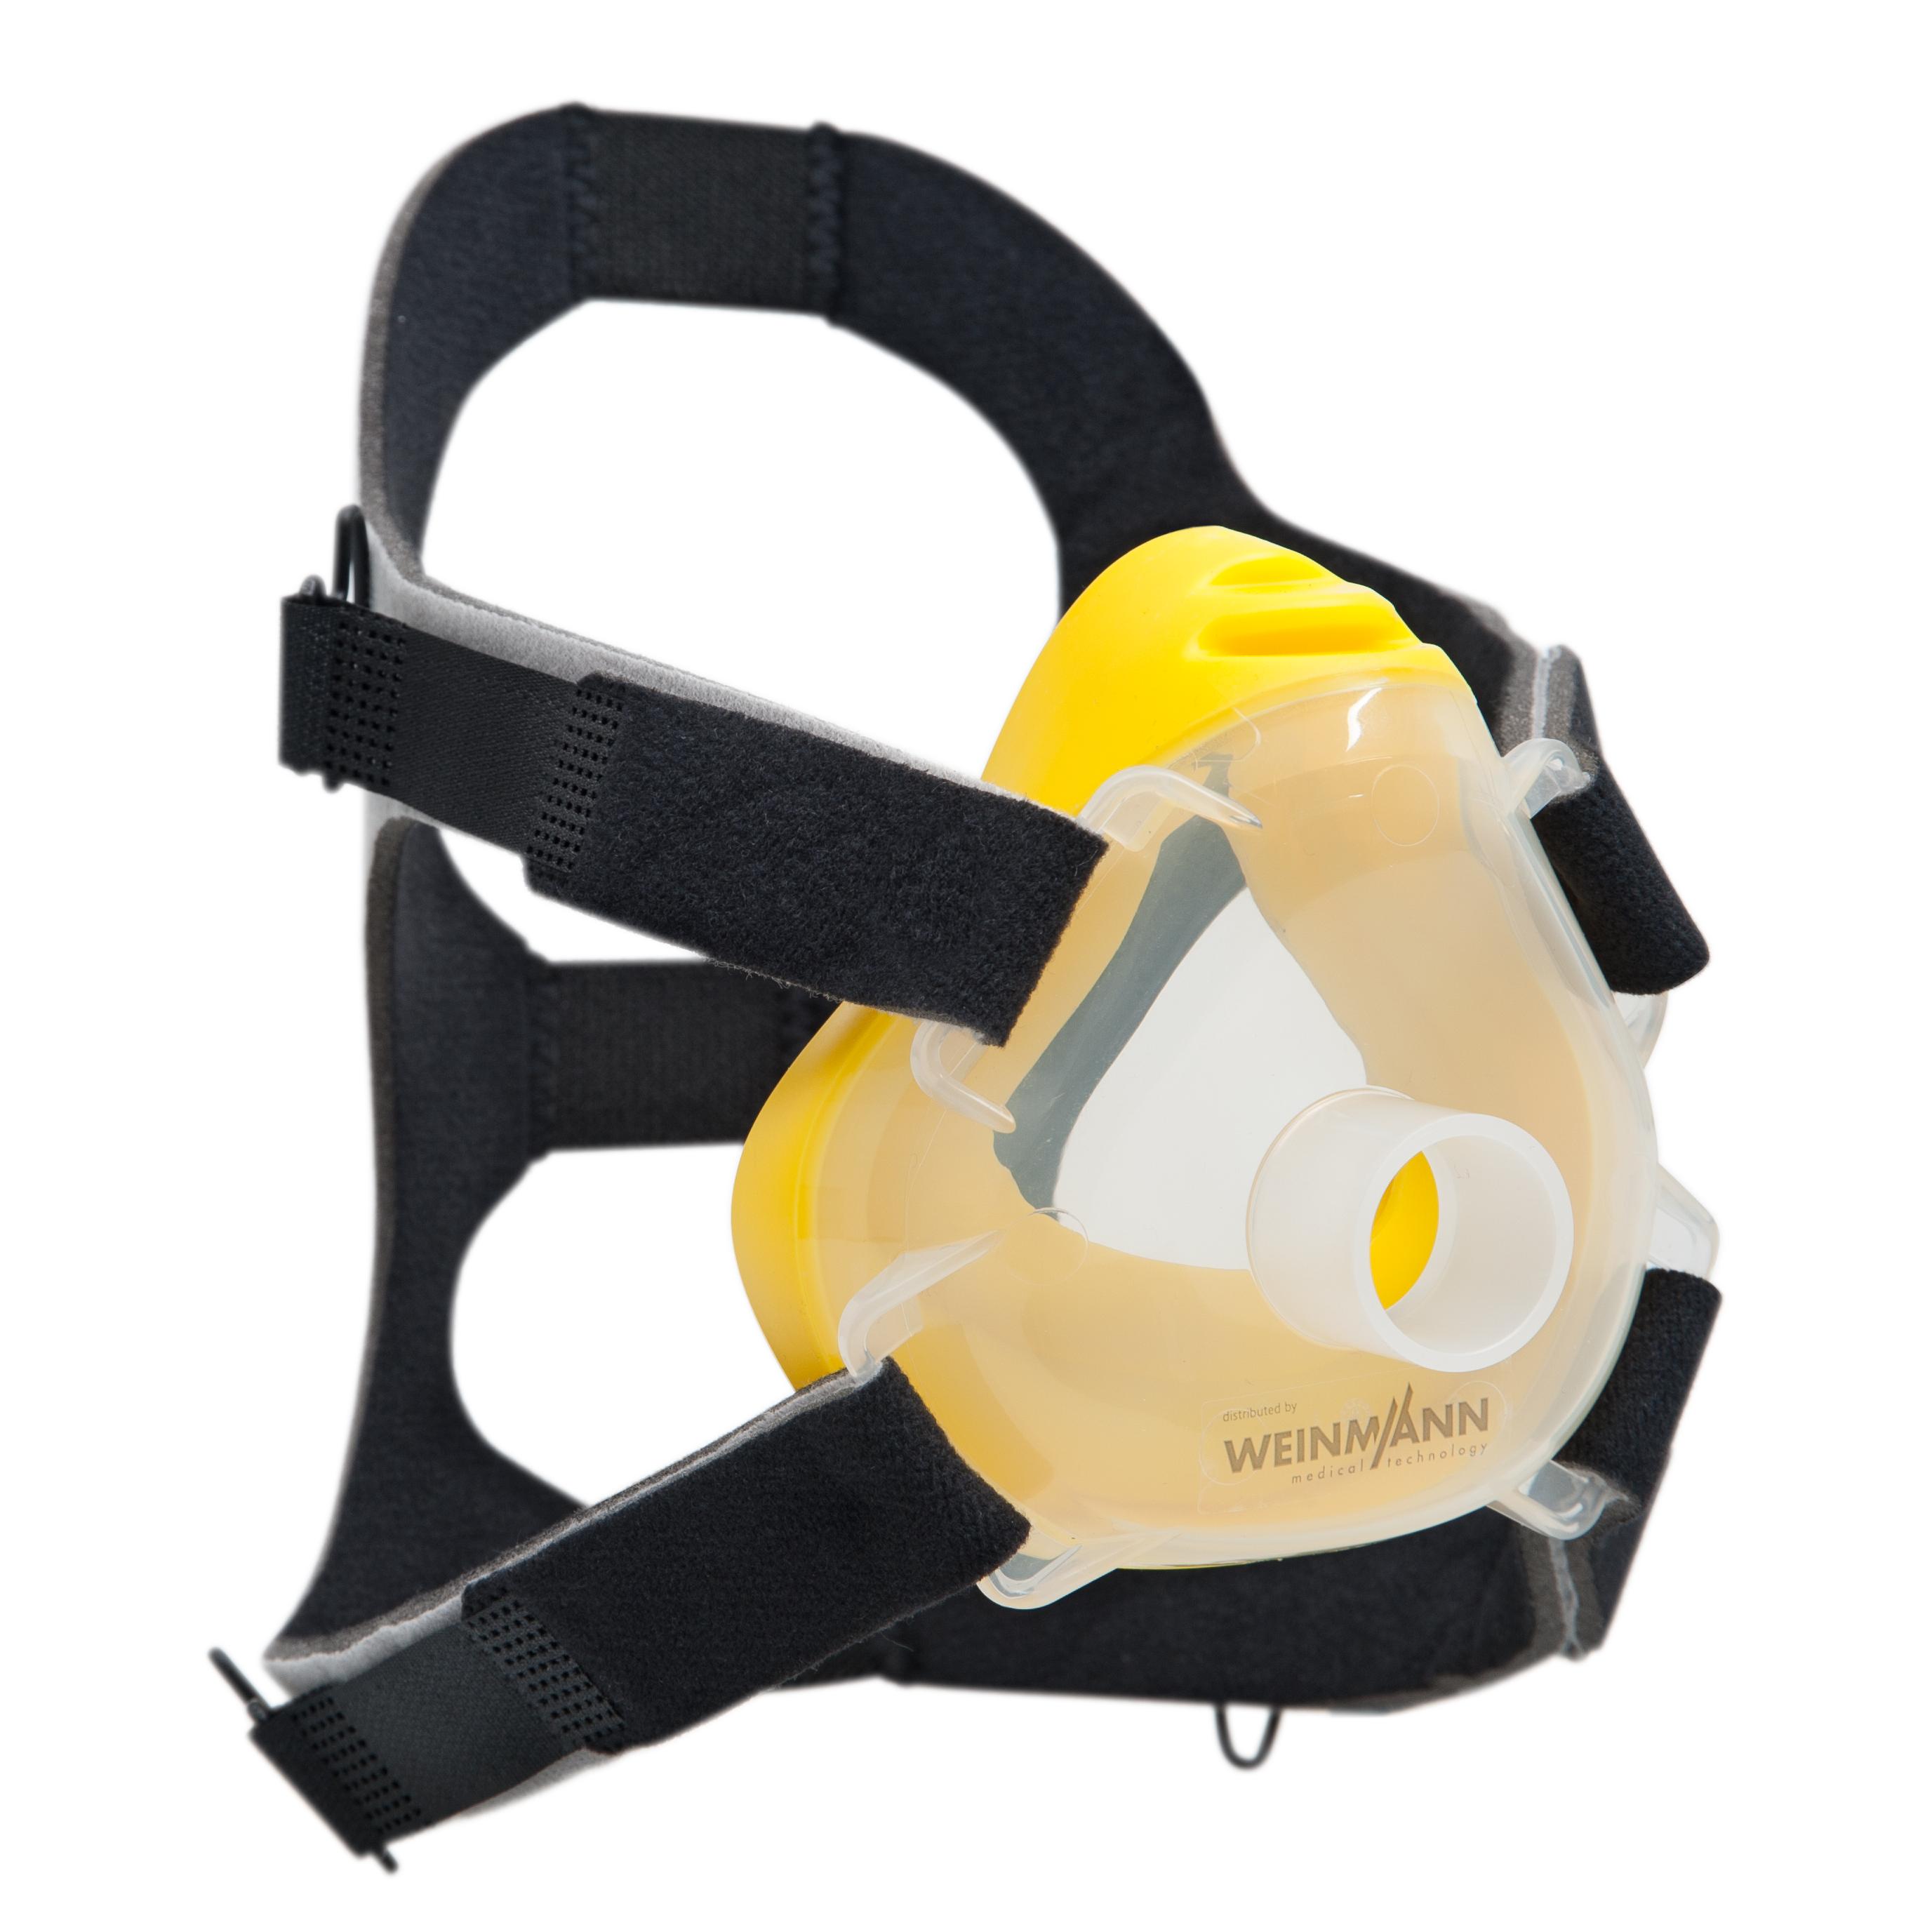 Premium CPAP-/NIV-Einwegmaske inkl. Kopfbänderung  Größe S (Kinder)